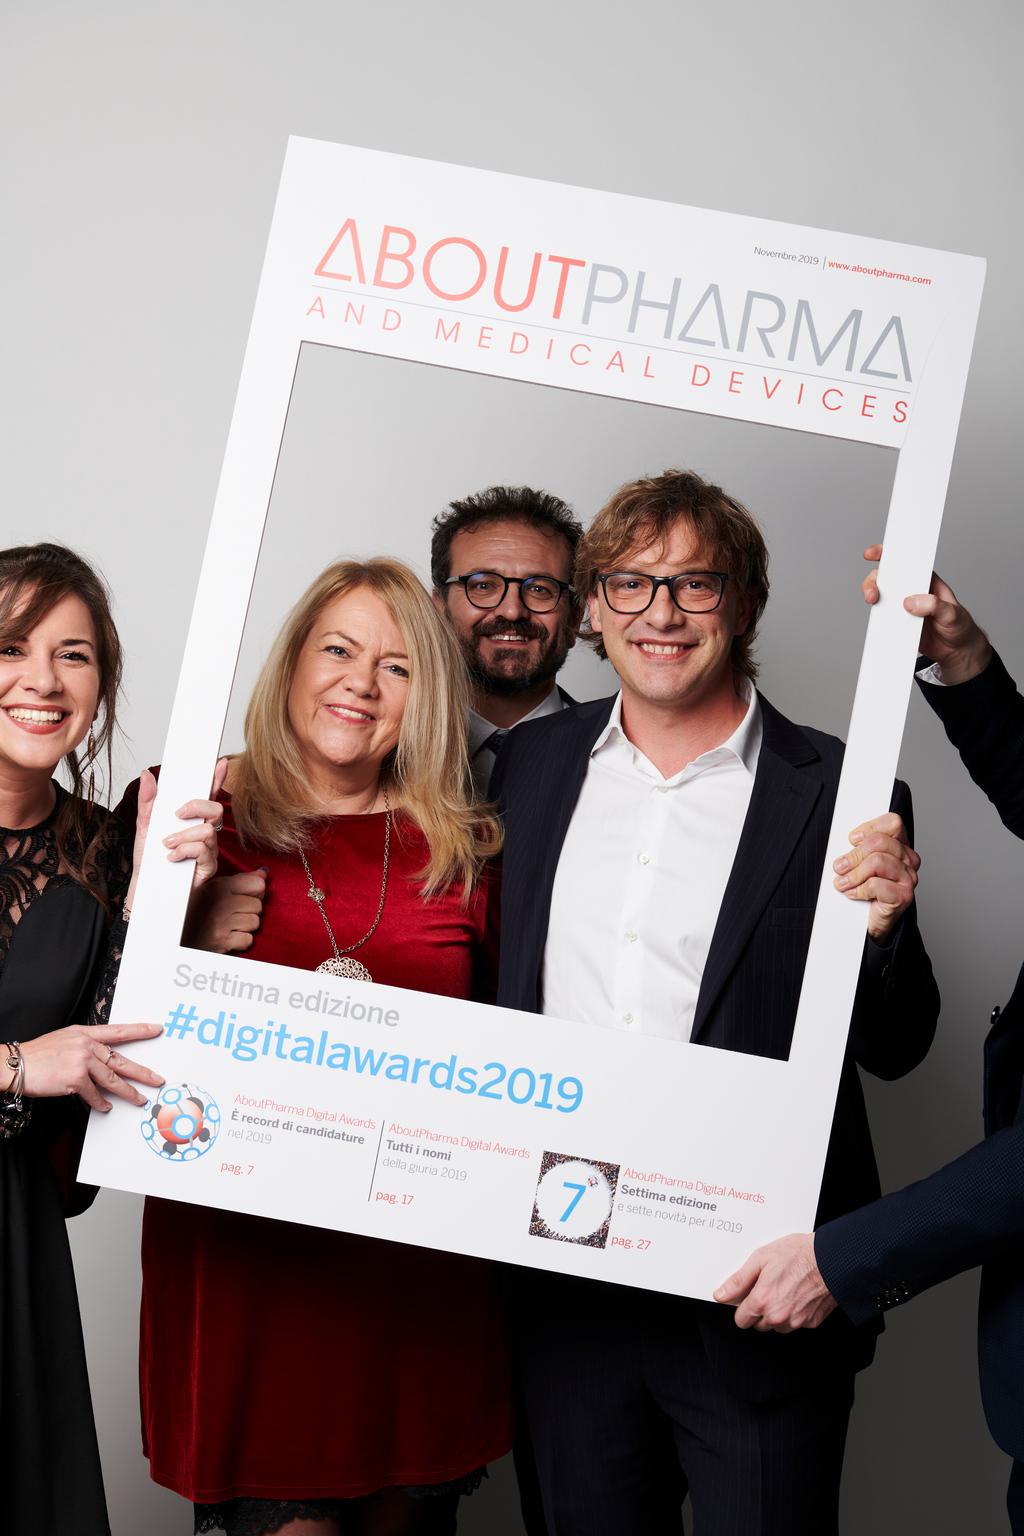 Photobooth AboutPharma Digital Awards 2019_161